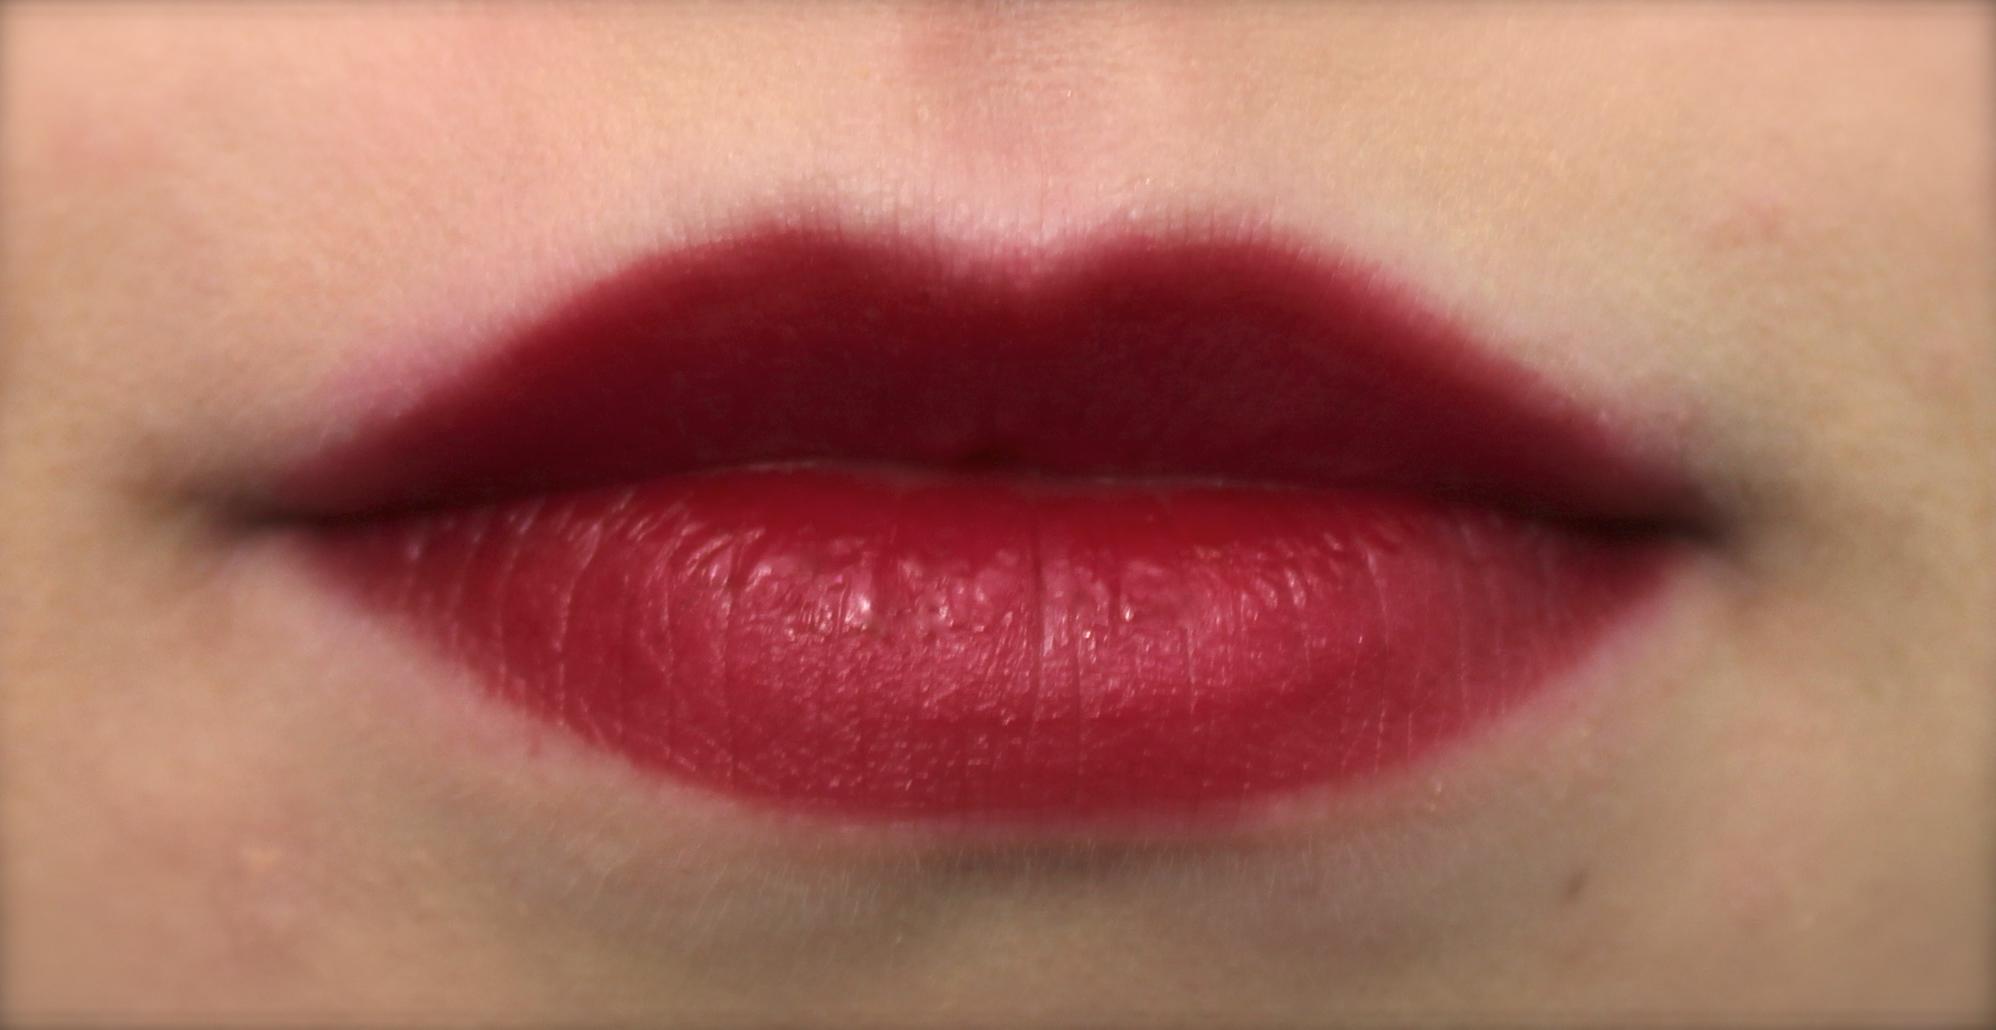 Sleek Lipstick in Cherry